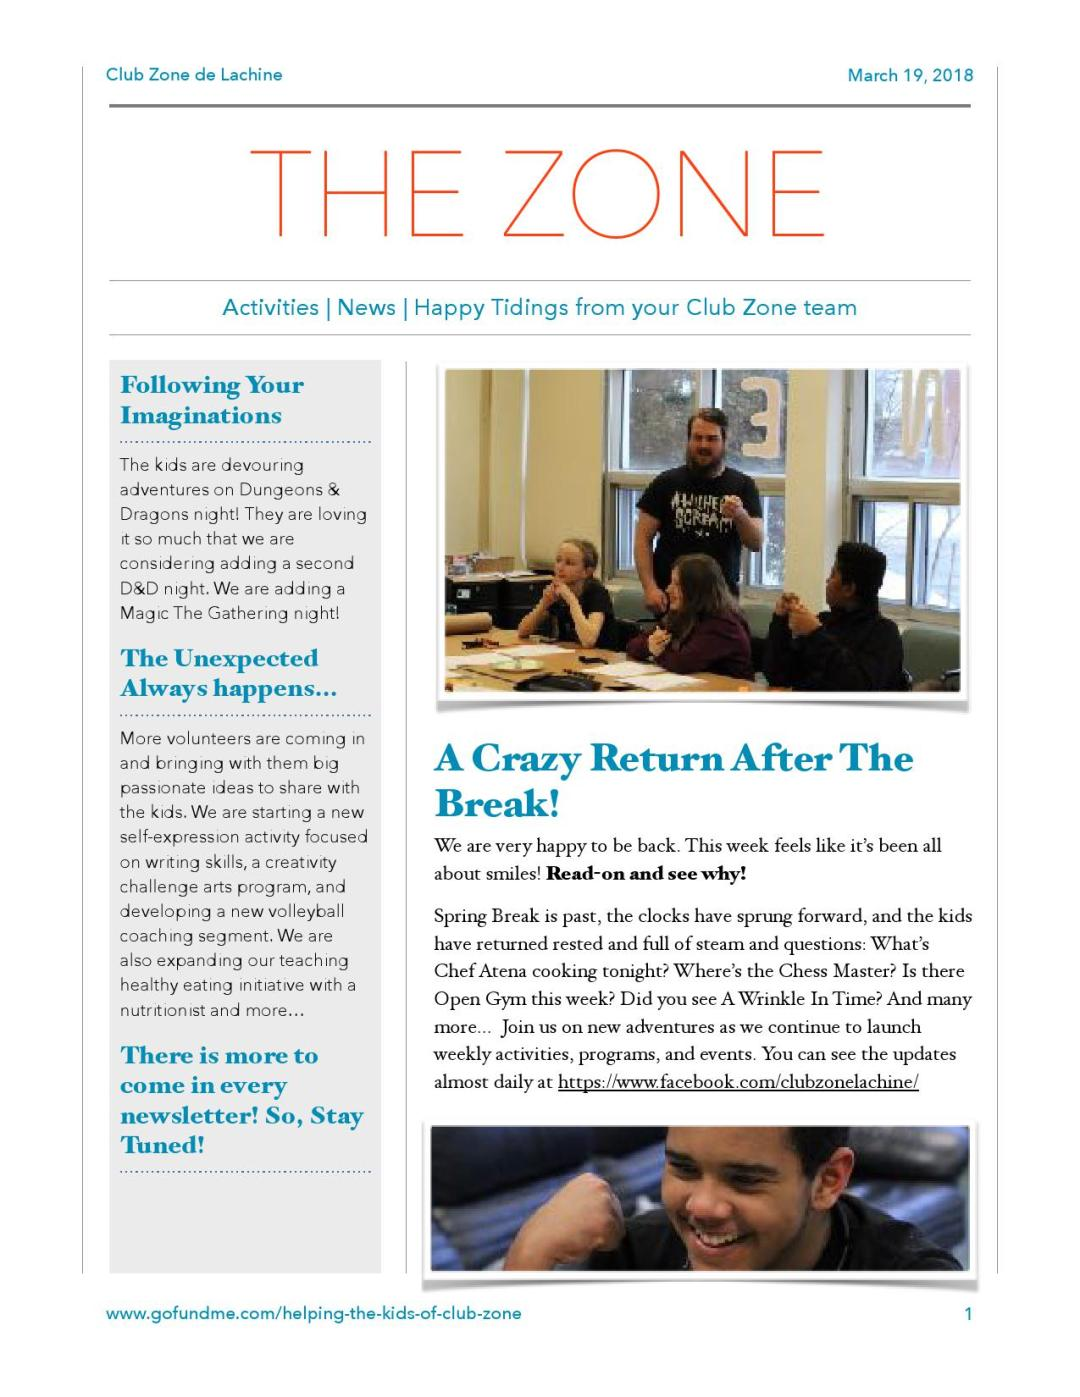 Club Zone Newsletter 2018-03-19_1